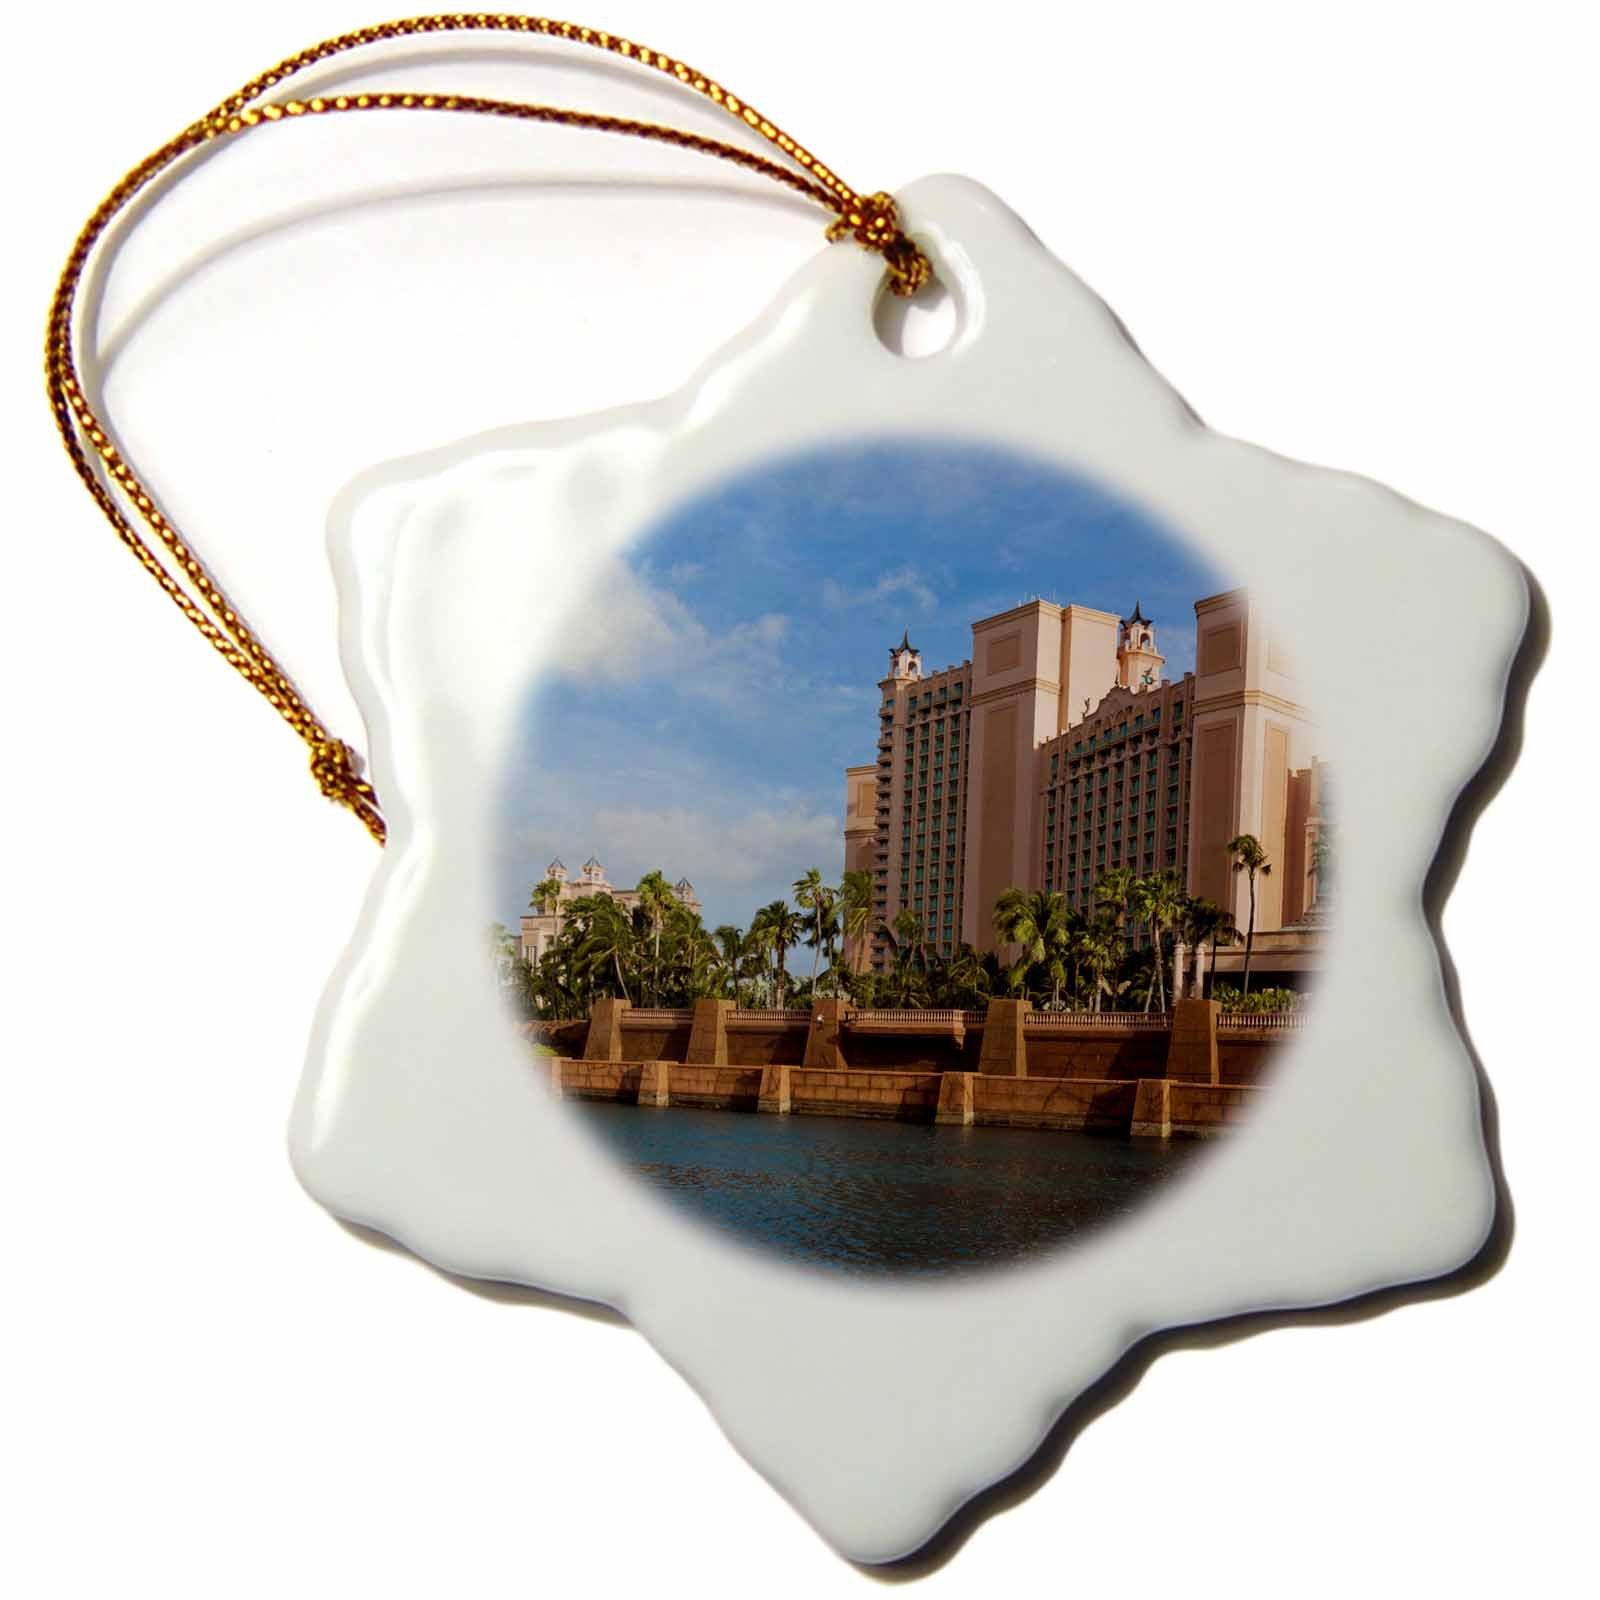 3dRose orn_134136_1 Bahamas, New Providence Island, Atlantis Hotel Ca05 Wbi0502 Walter Bibikow Snowflake Ornament, Porcelain, 3-Inch